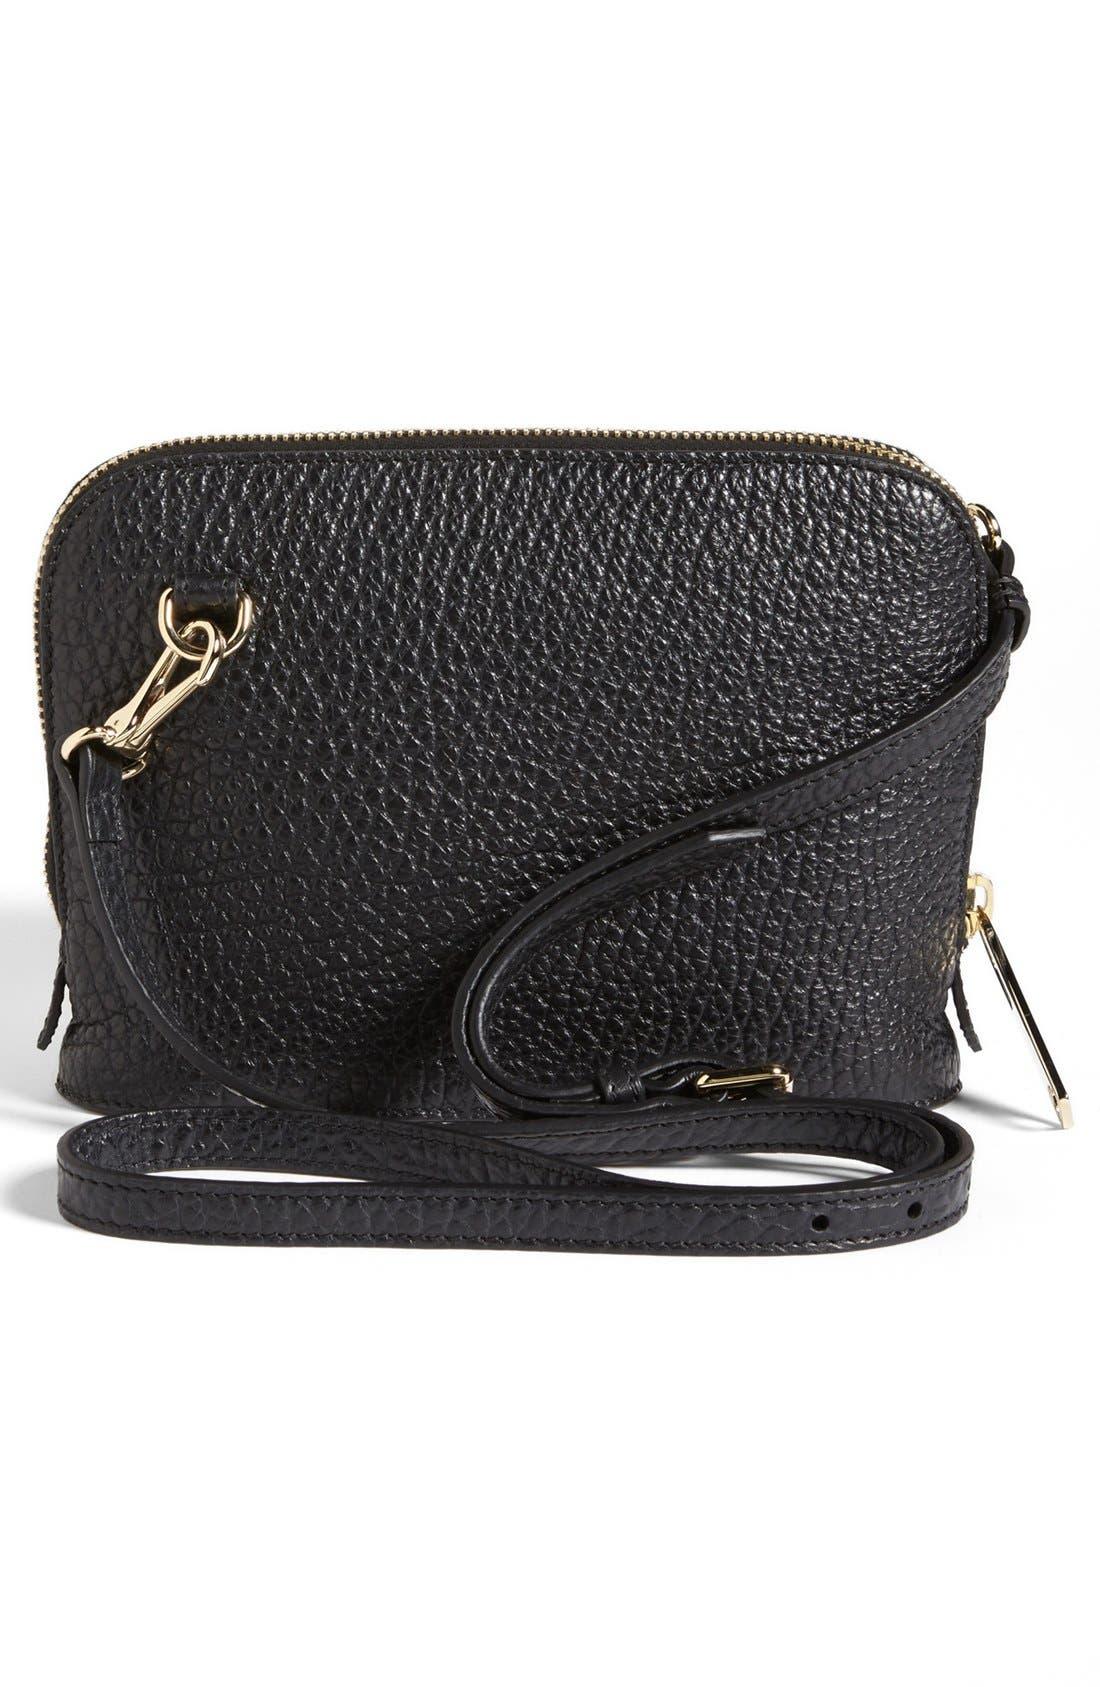 Alternate Image 4  - Burberry 'Small Harrogate' Leather Crossbody Bag